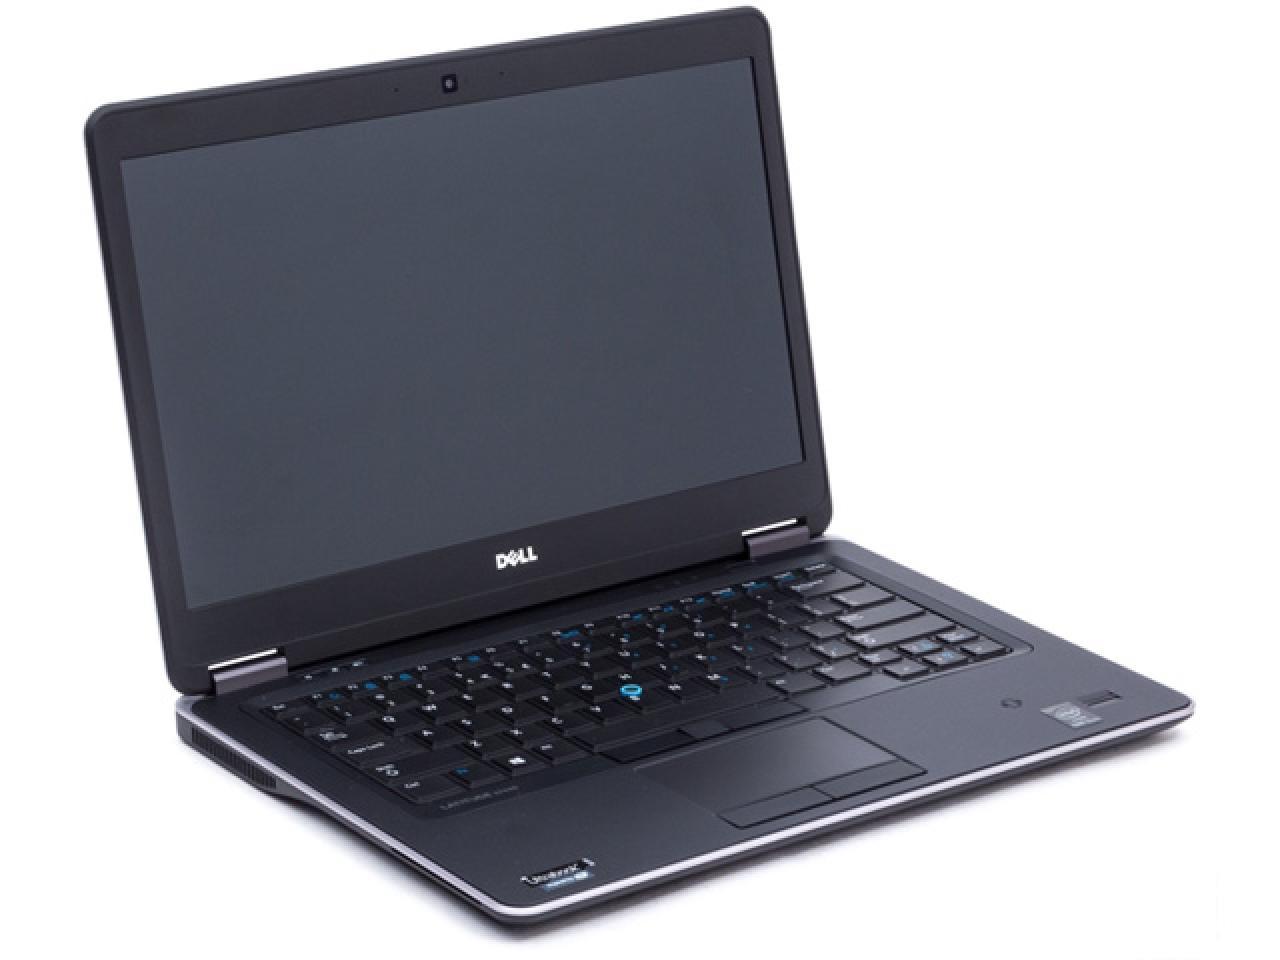 Dell Latitude E7440  - shop.bb-net.de